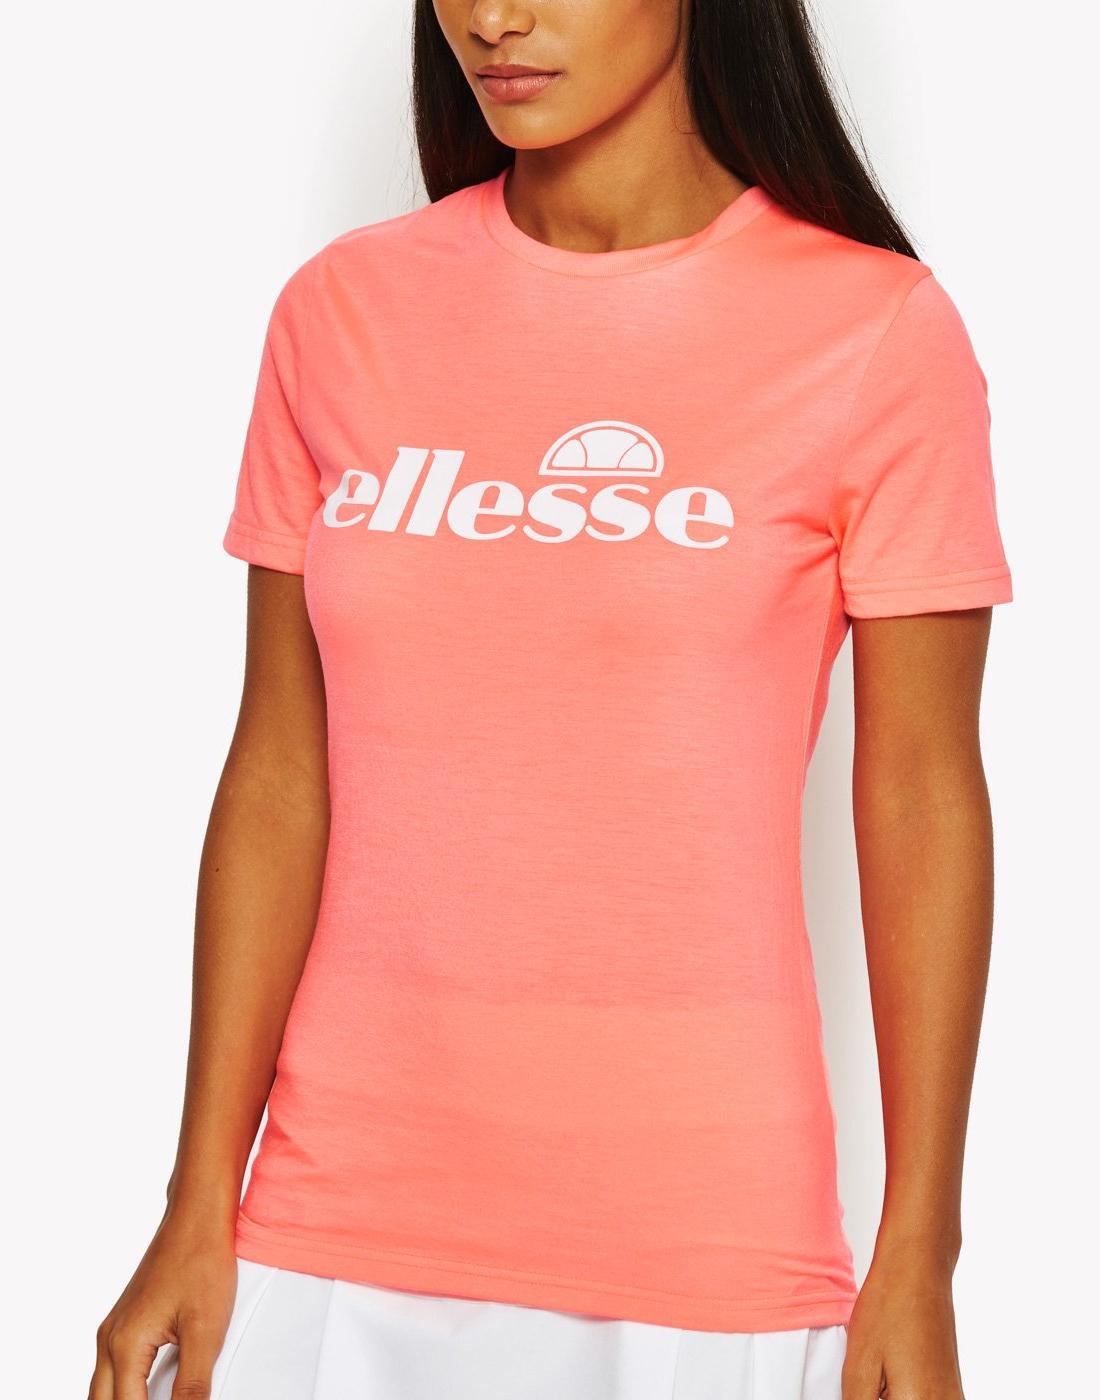 Camicia ELLESSE Womens Retro Tennis T-Shirt